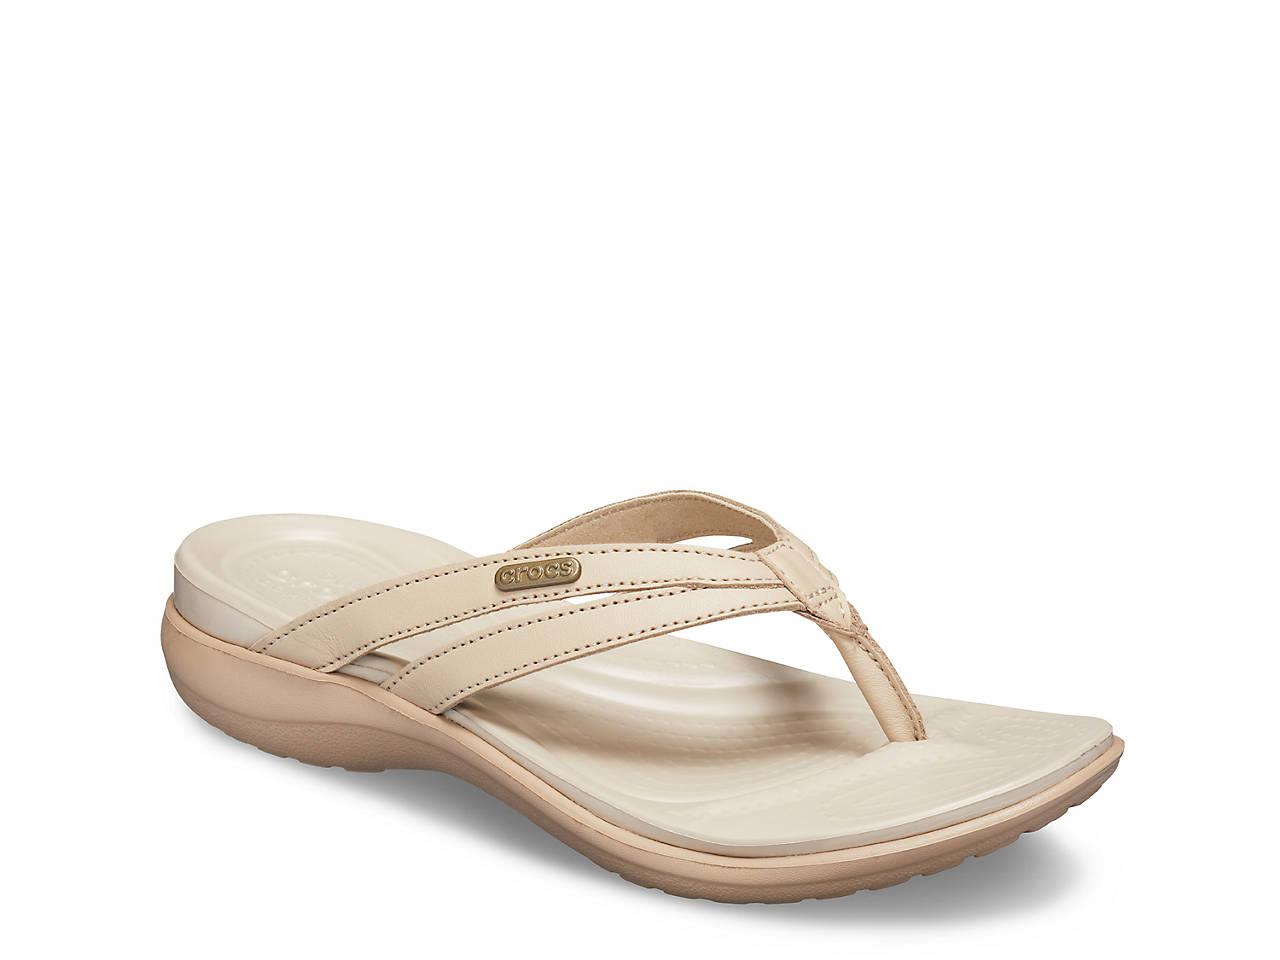 c38341867ea Crocs Capri Basic Wedge Sandal Women's Shoes | DSW